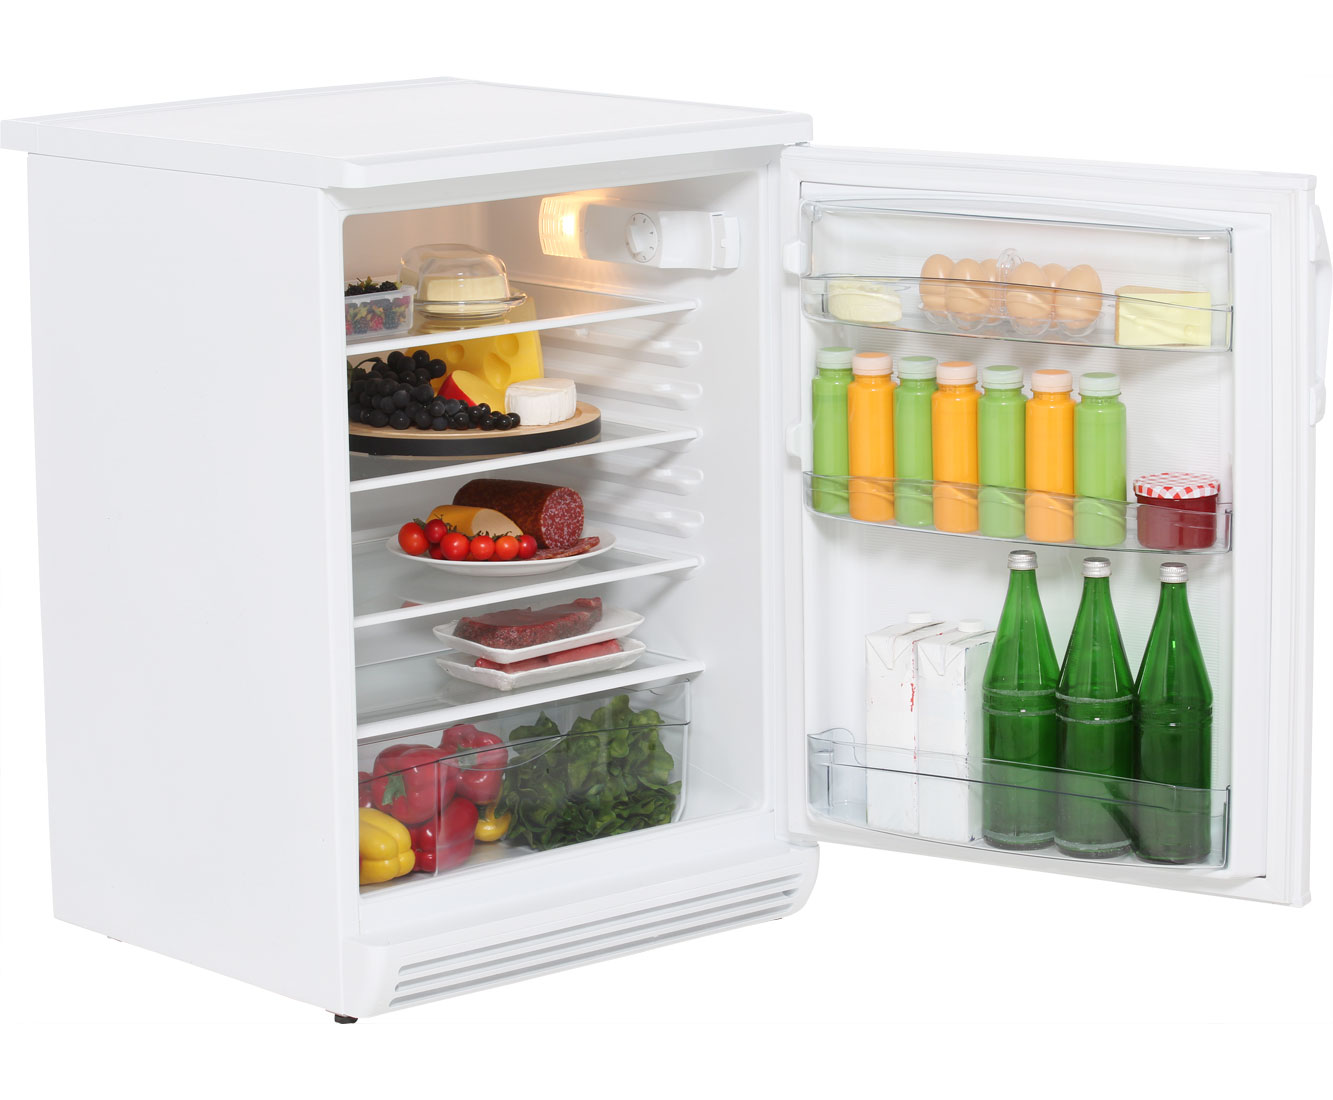 Gorenje Kühlschrank Xxl : Kühlschrank gorenje gorenje heute ist der offizielle